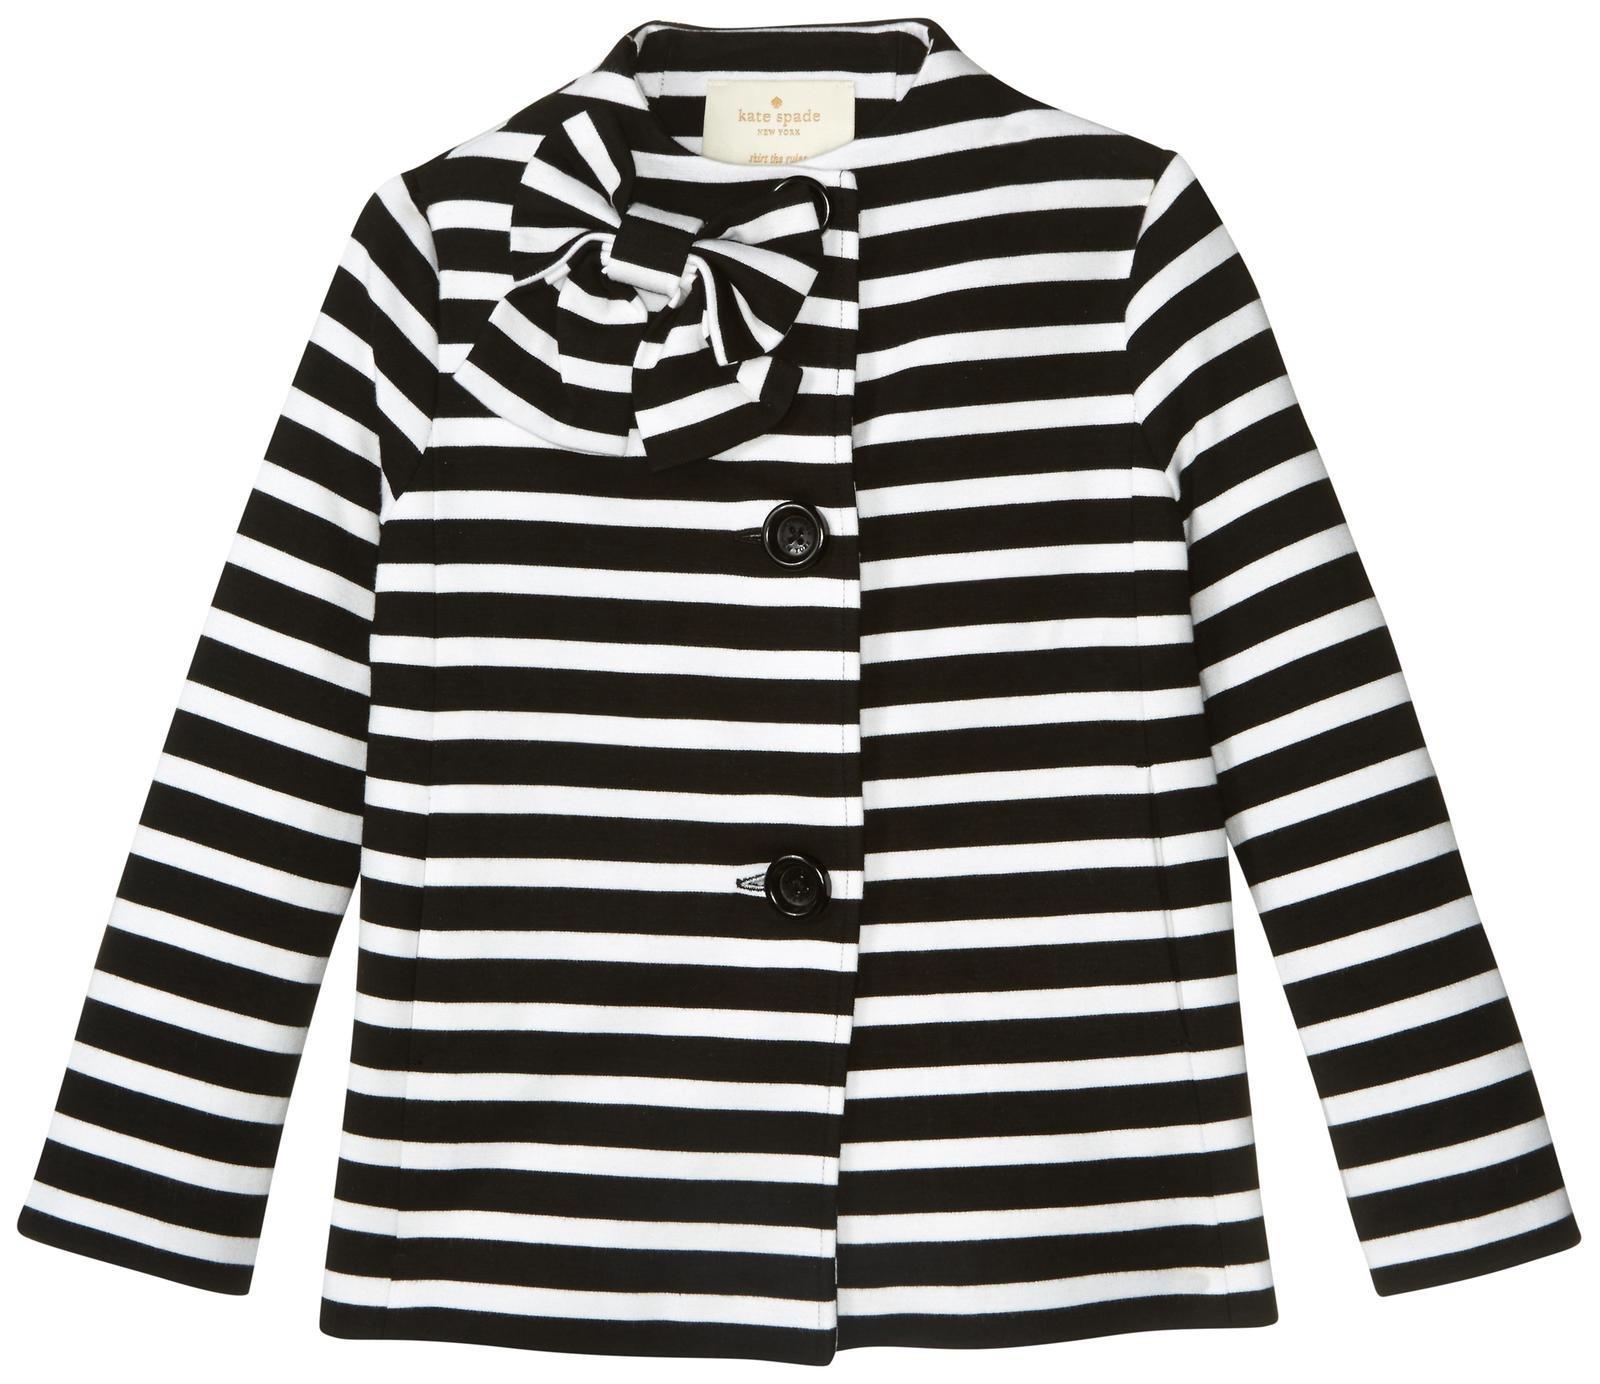 Kate Spade New York Girls' Dorothy Jacket, Black/Cream Stripe, 3T